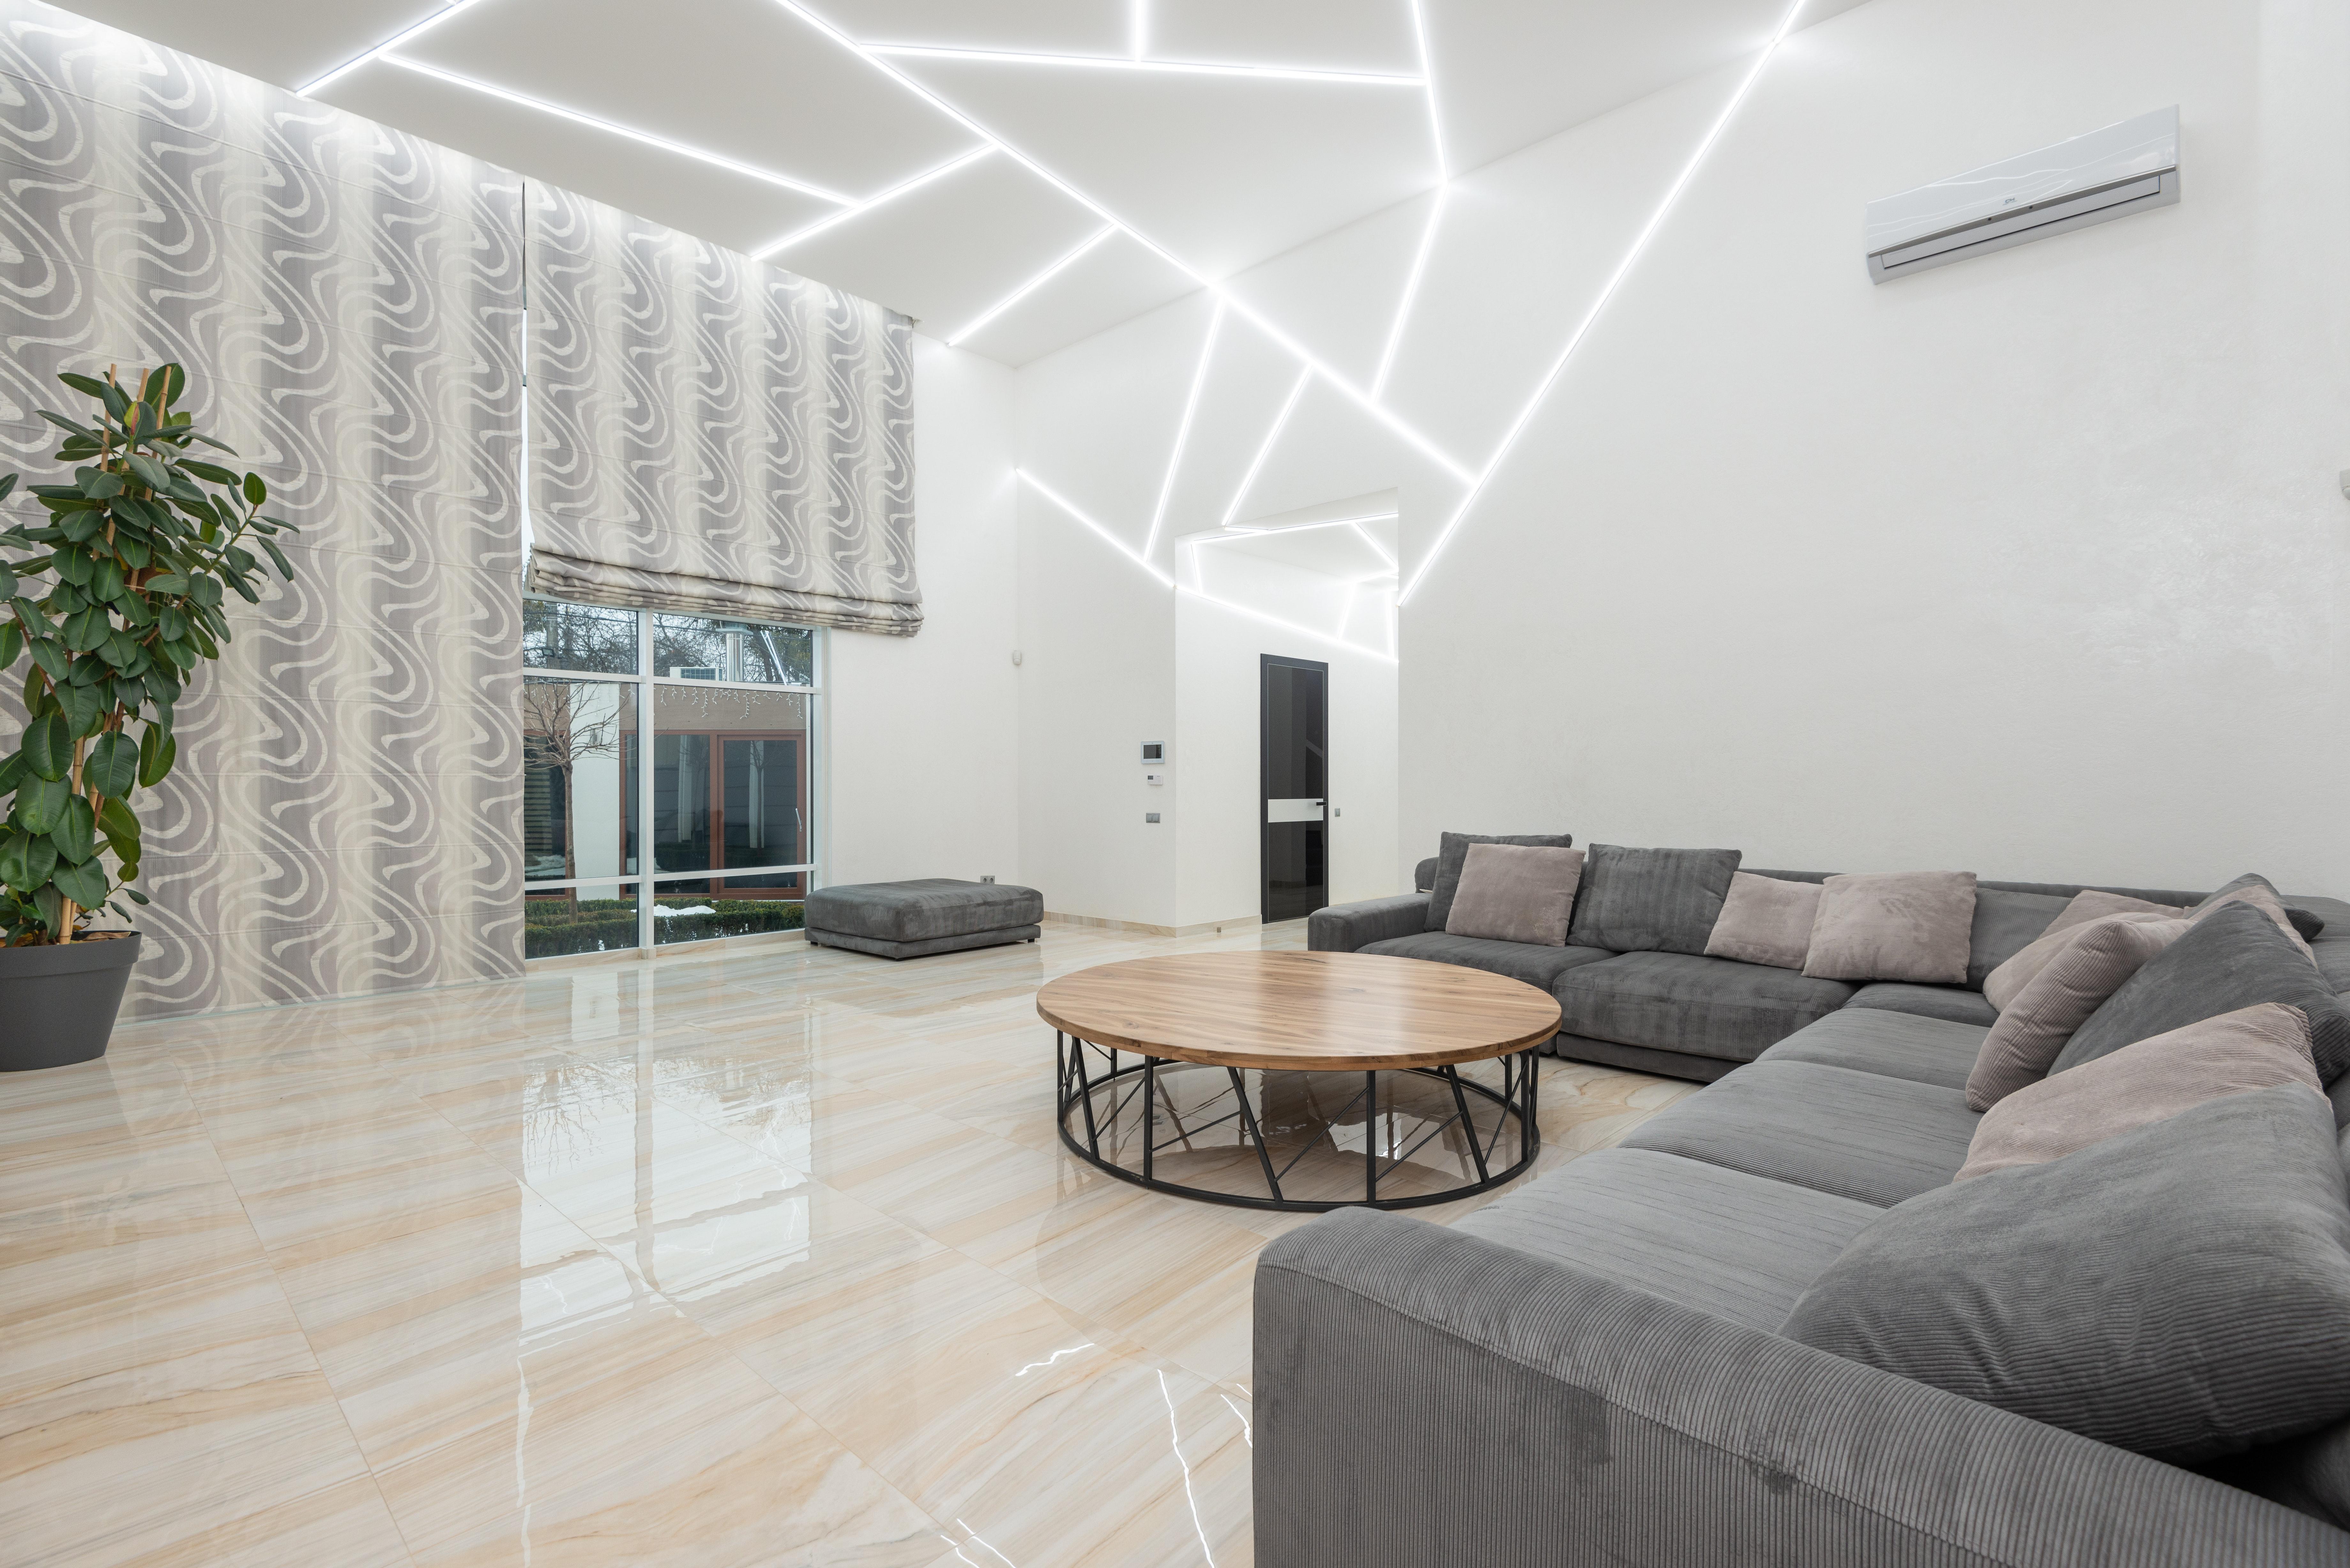 Two-Bedroom Skyline Villa, Best Villas in Dubai